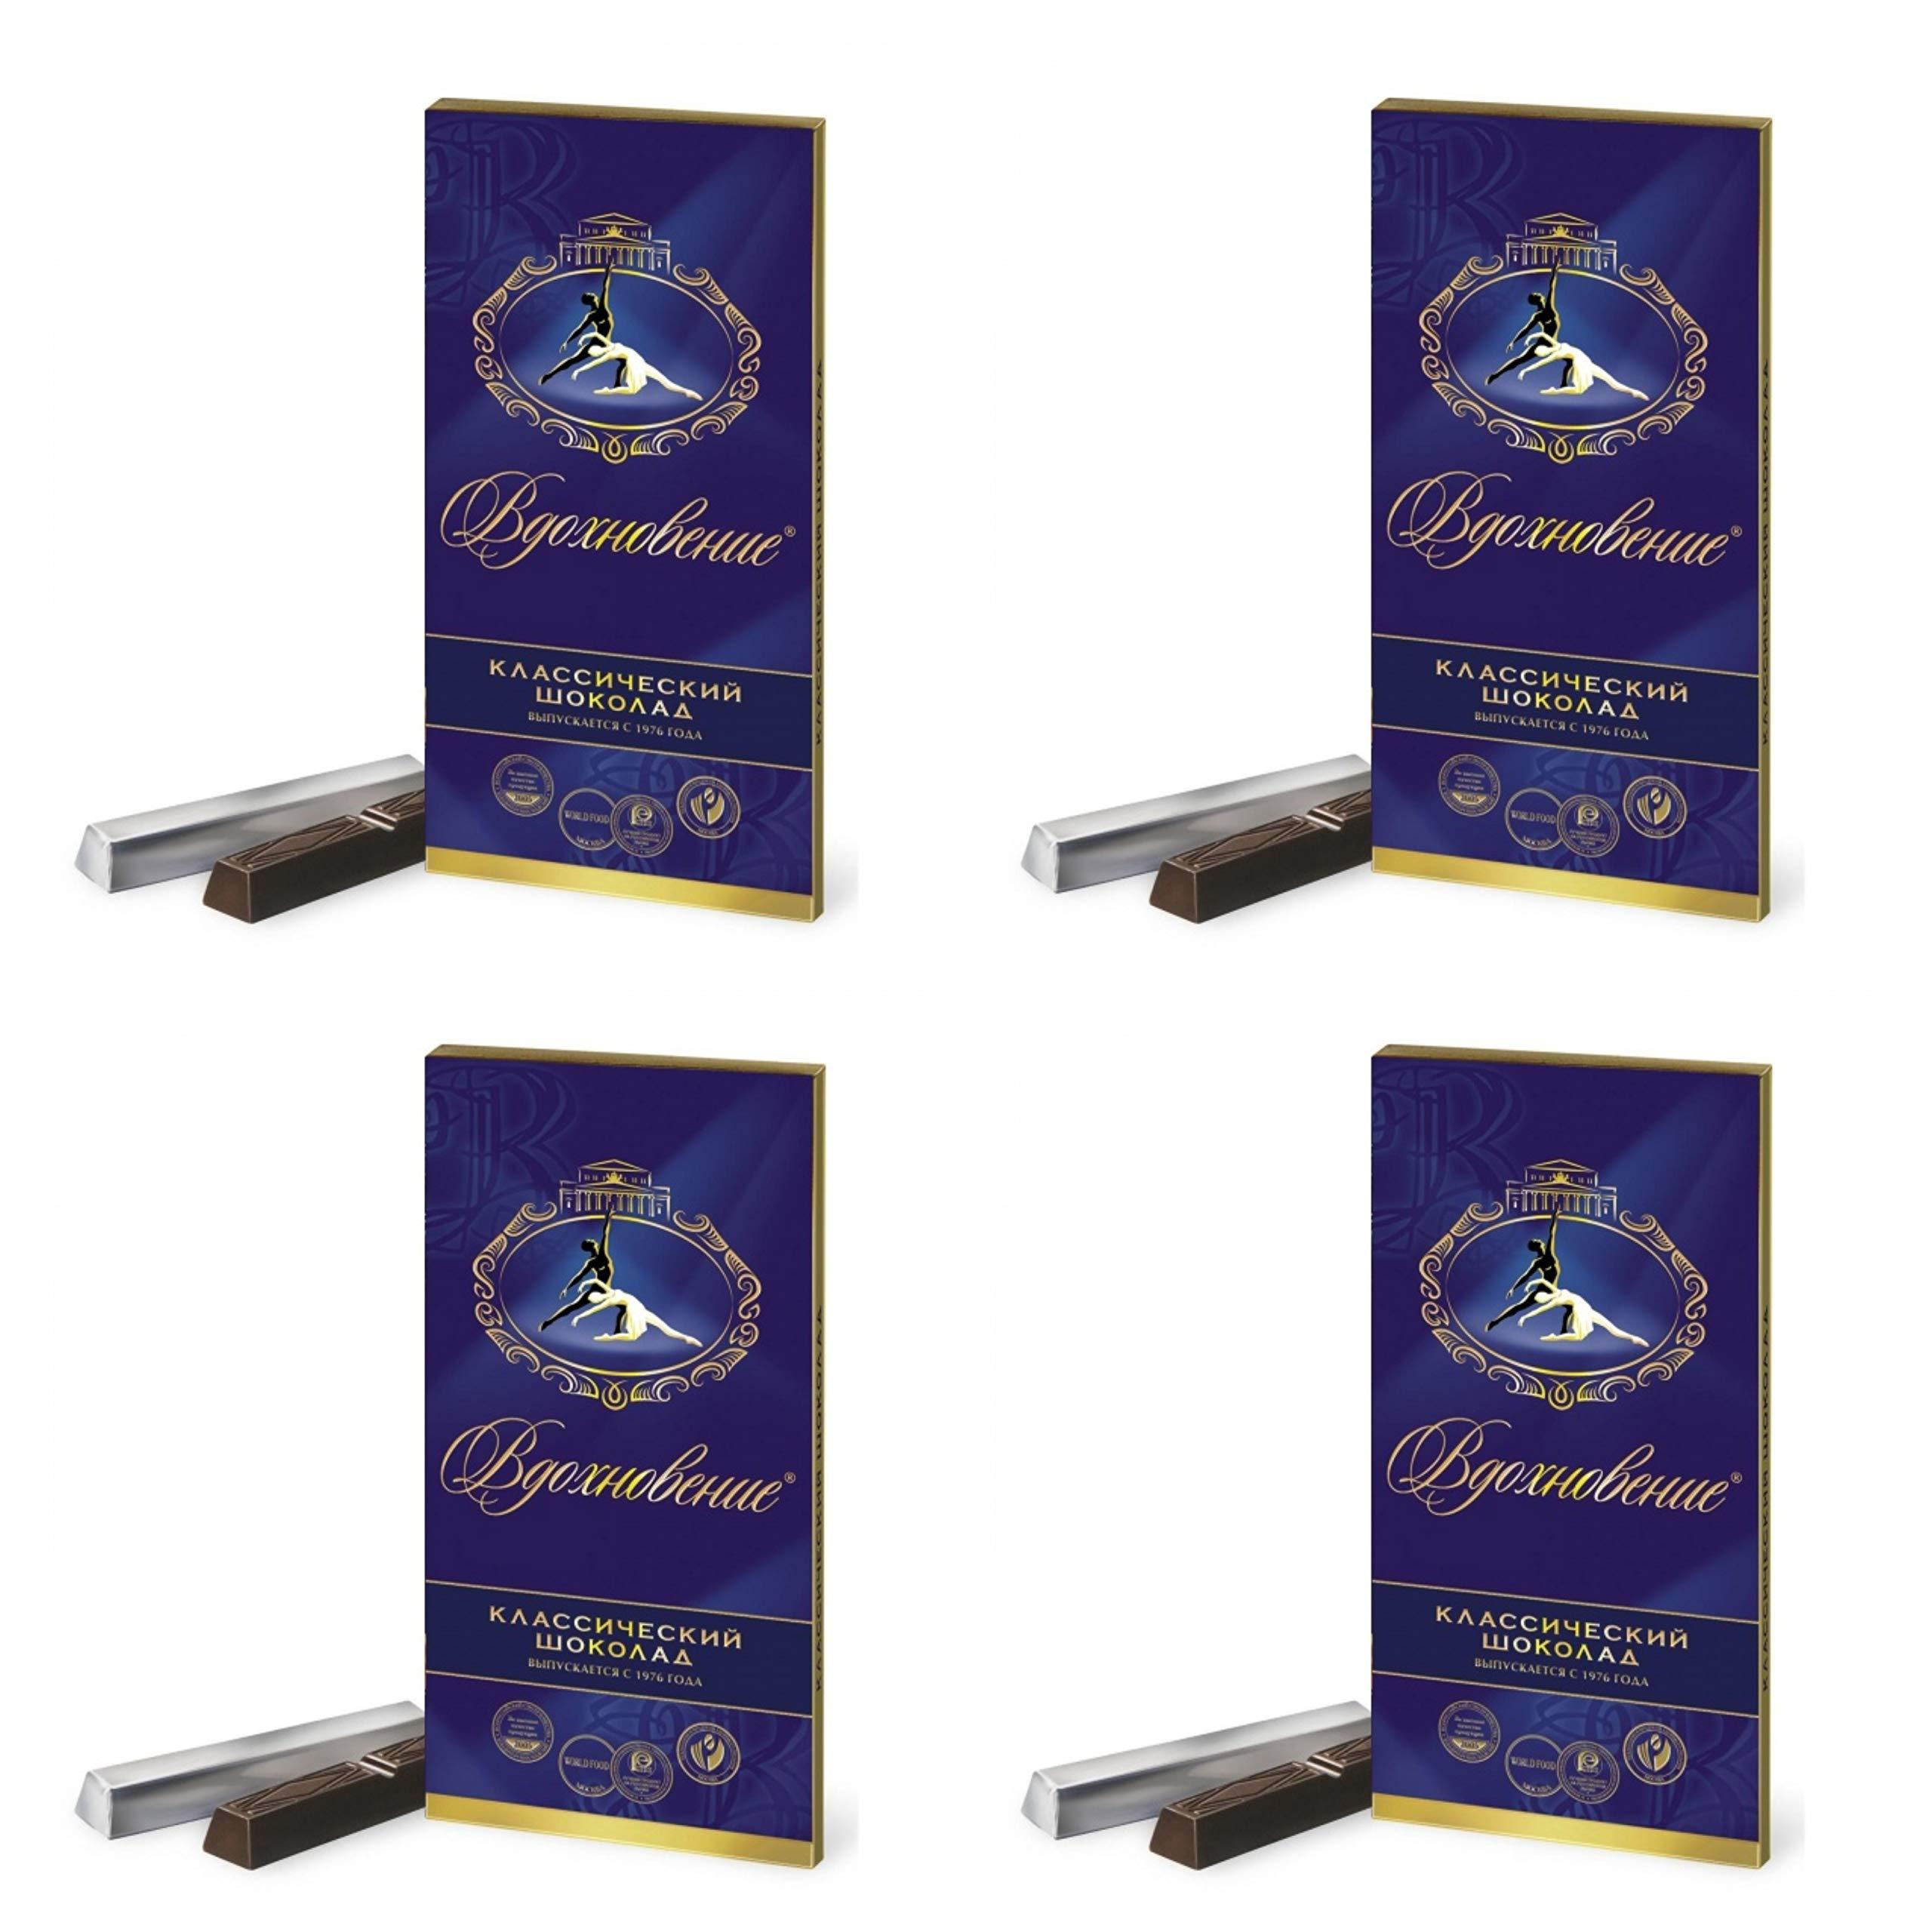 Russian Dark Chocolate «Vdohnovenie» Classic Pack of 4 Krasnyi Oktyabr